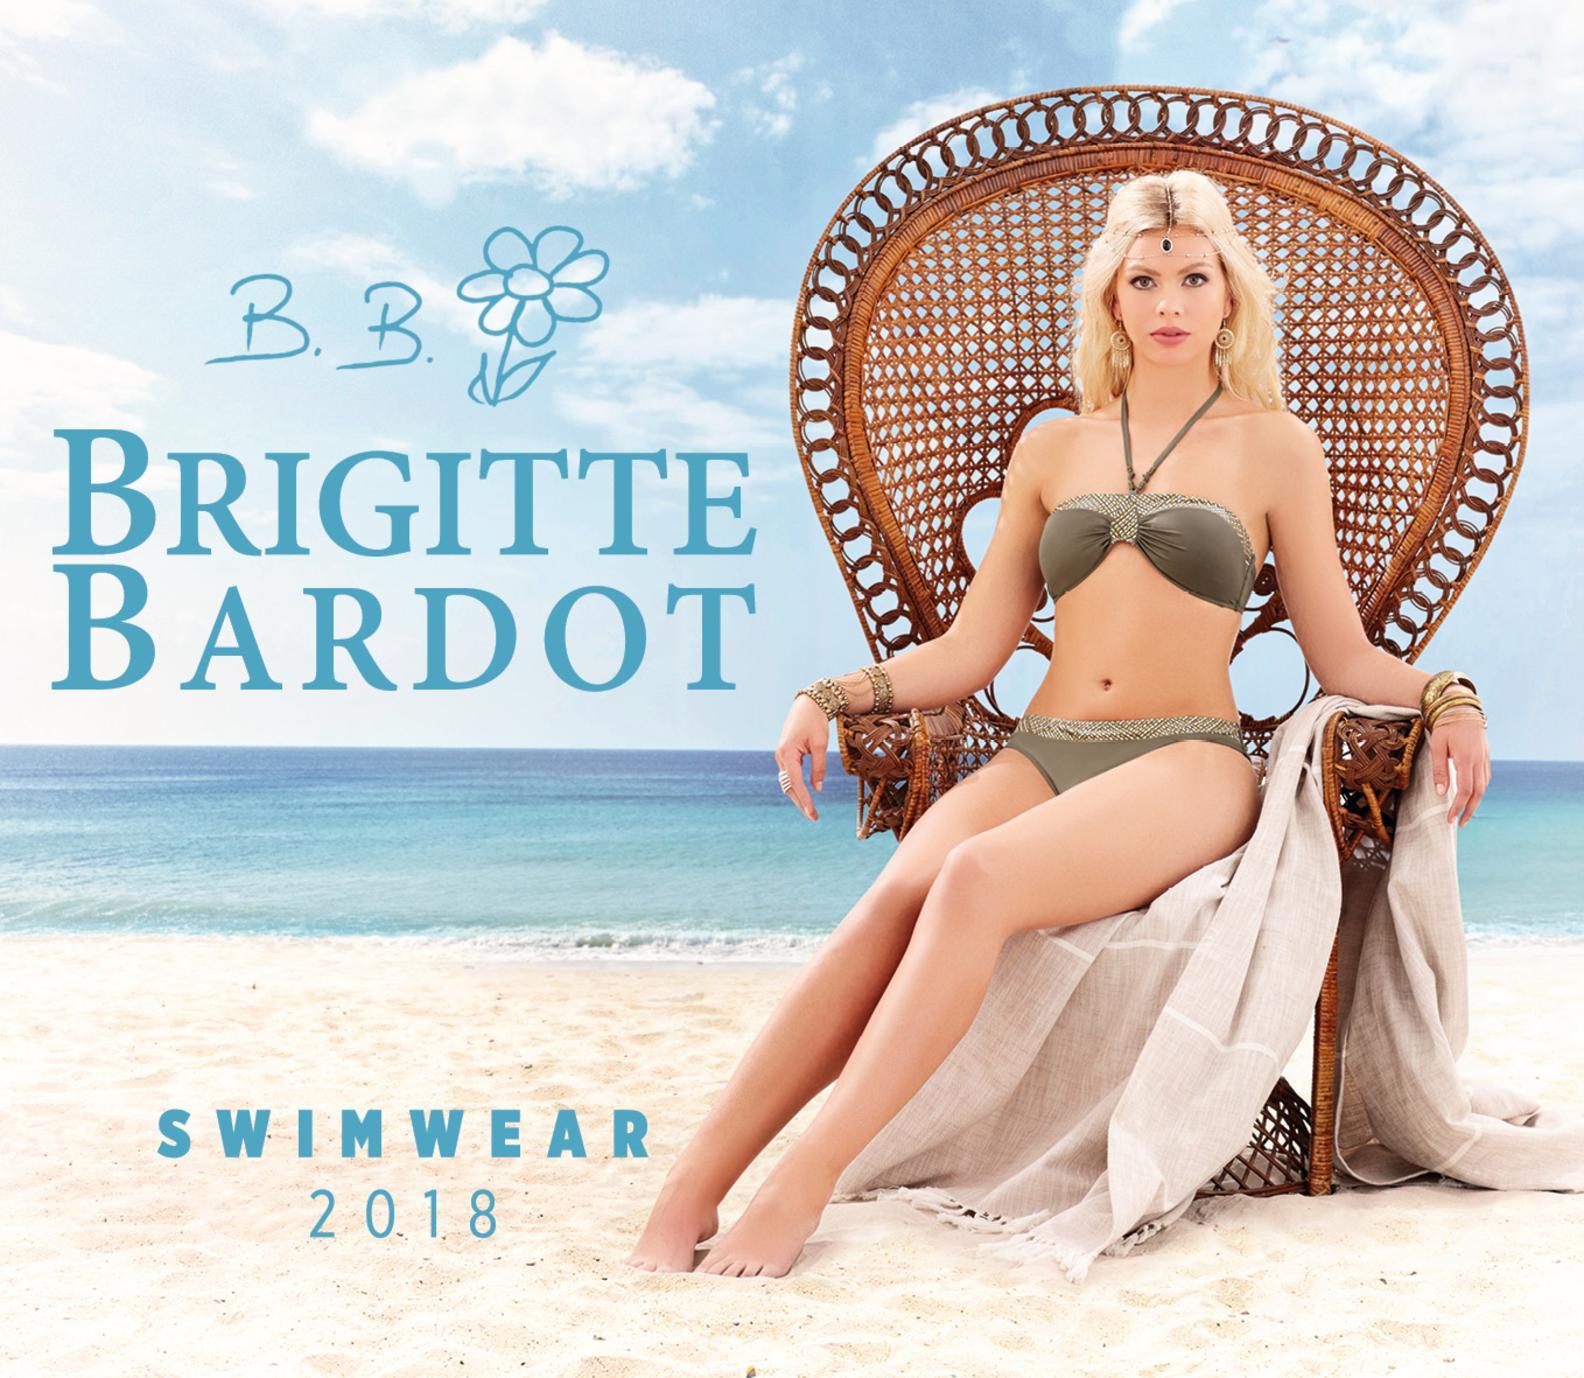 Brigitte BARDOT Swimwear 2018